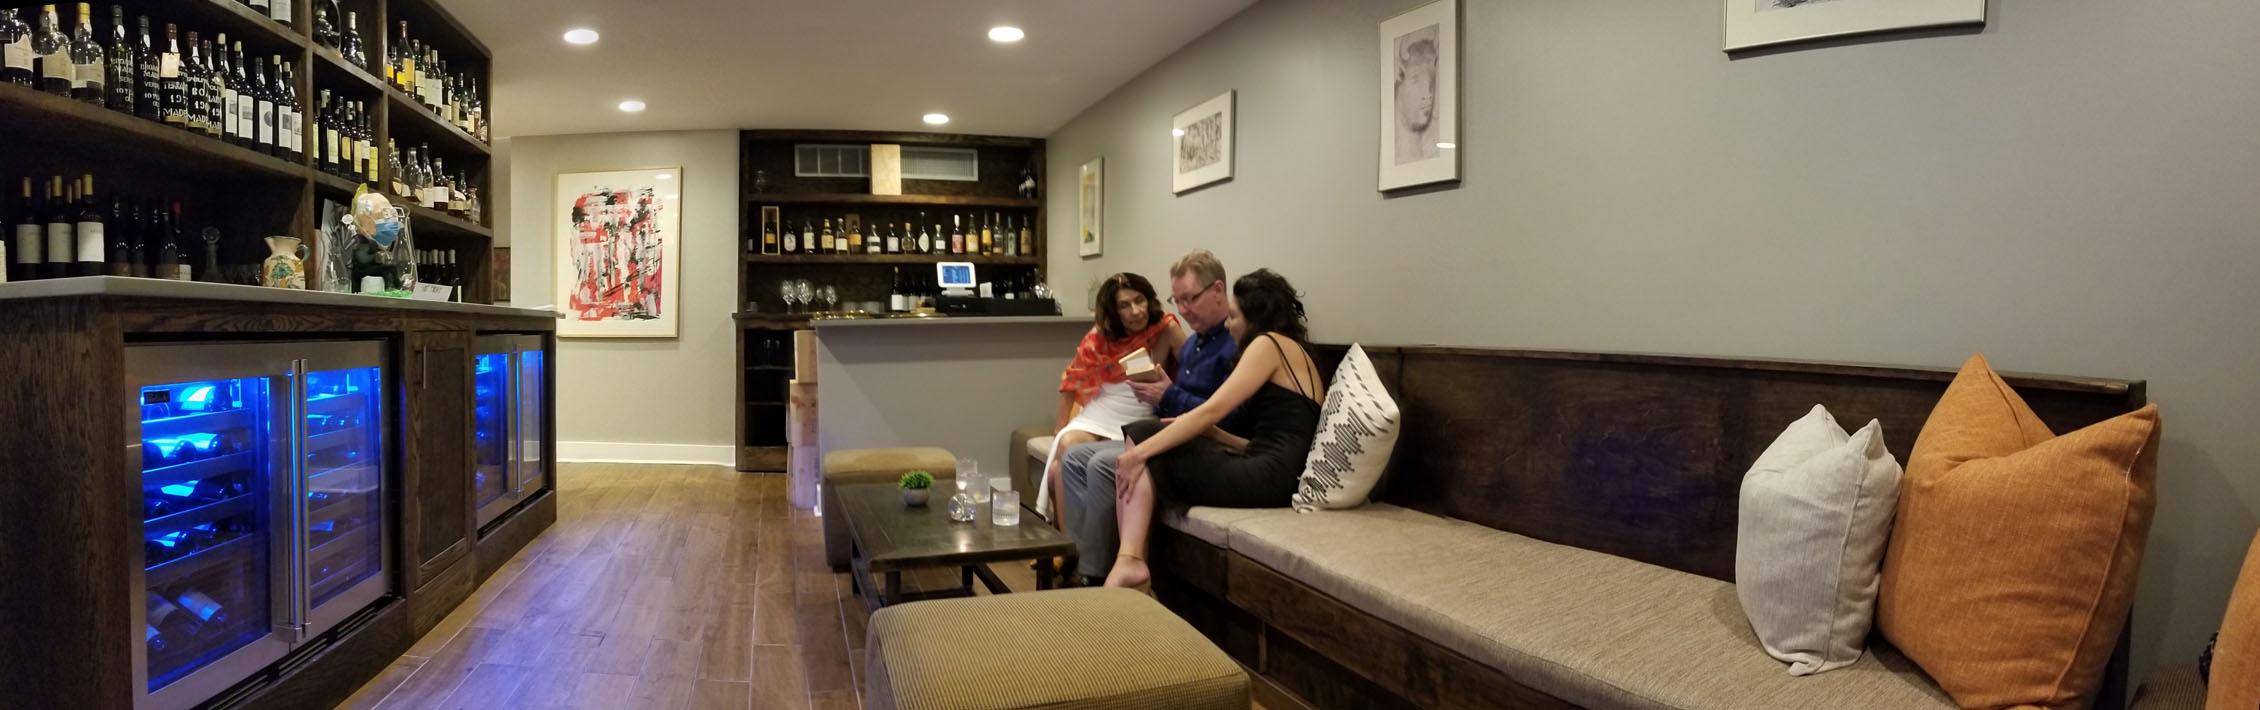 Xiquet Mezzanine Bar